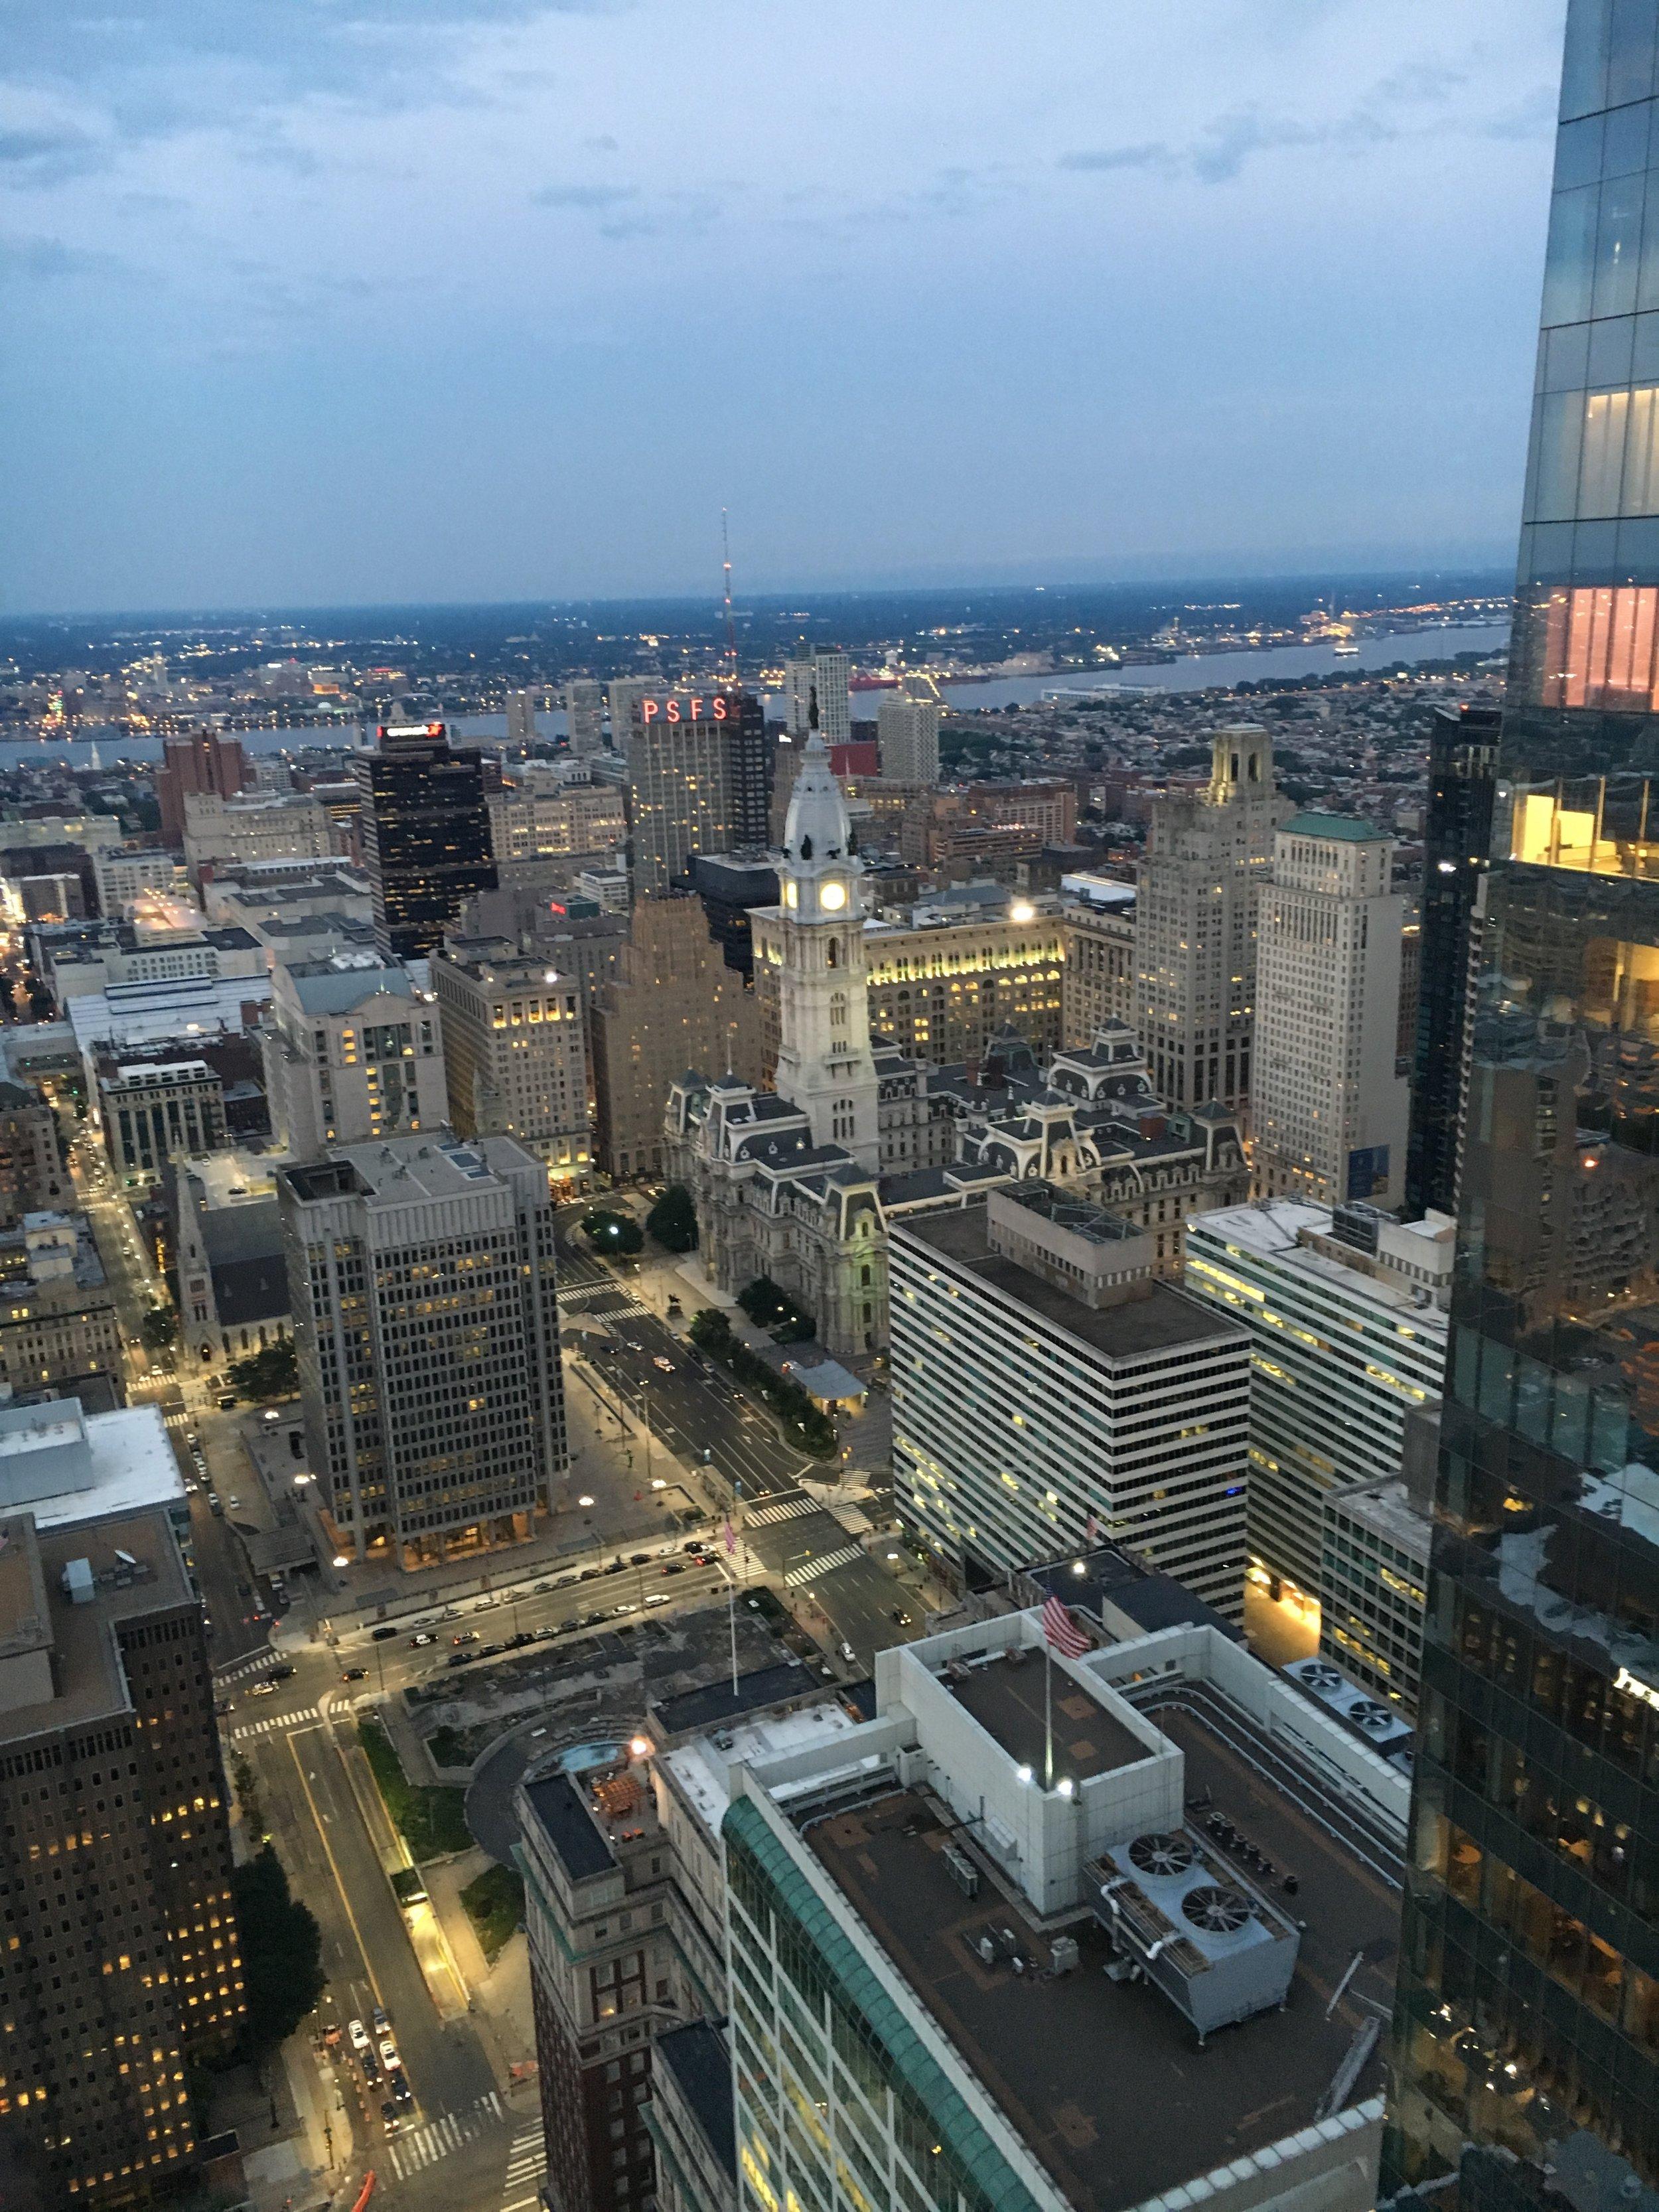 Philadelphia - from a rooftop beer garden just behind the Windsor